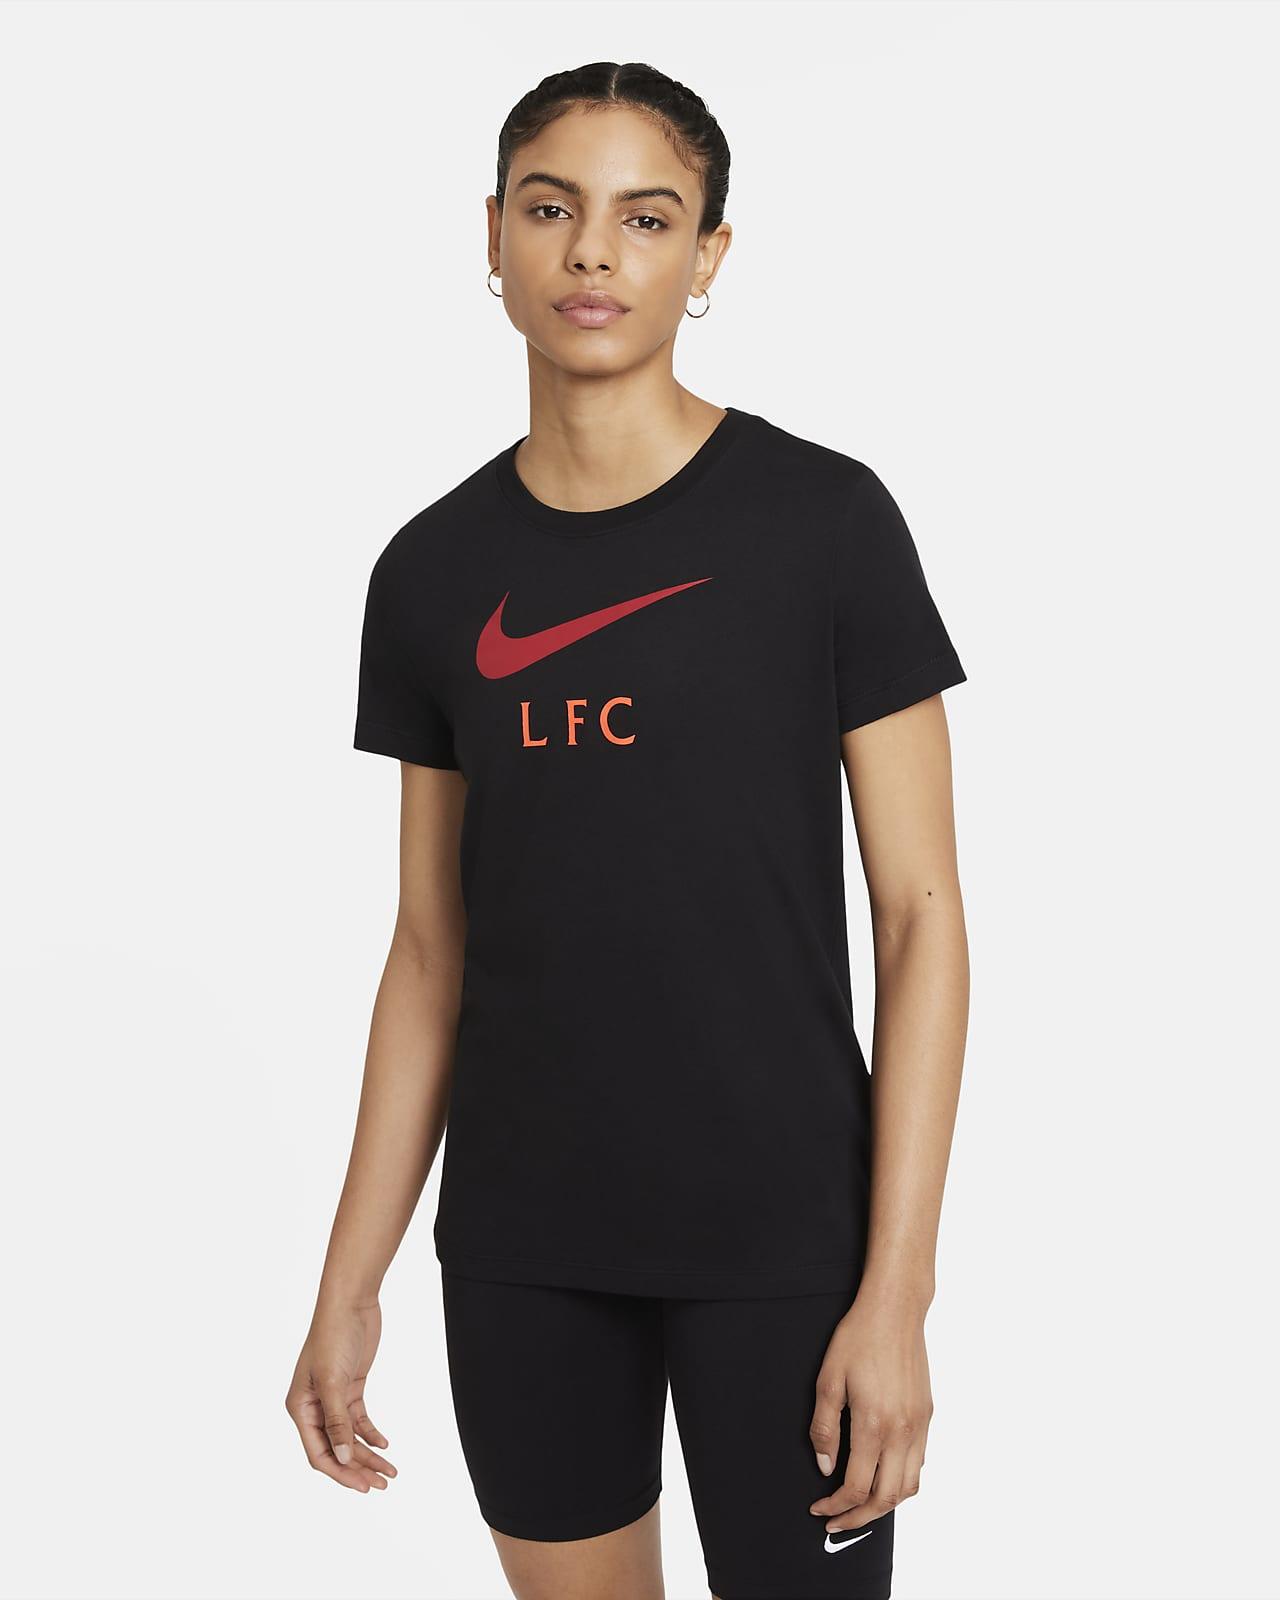 Liverpool F.C. Women's T-Shirt